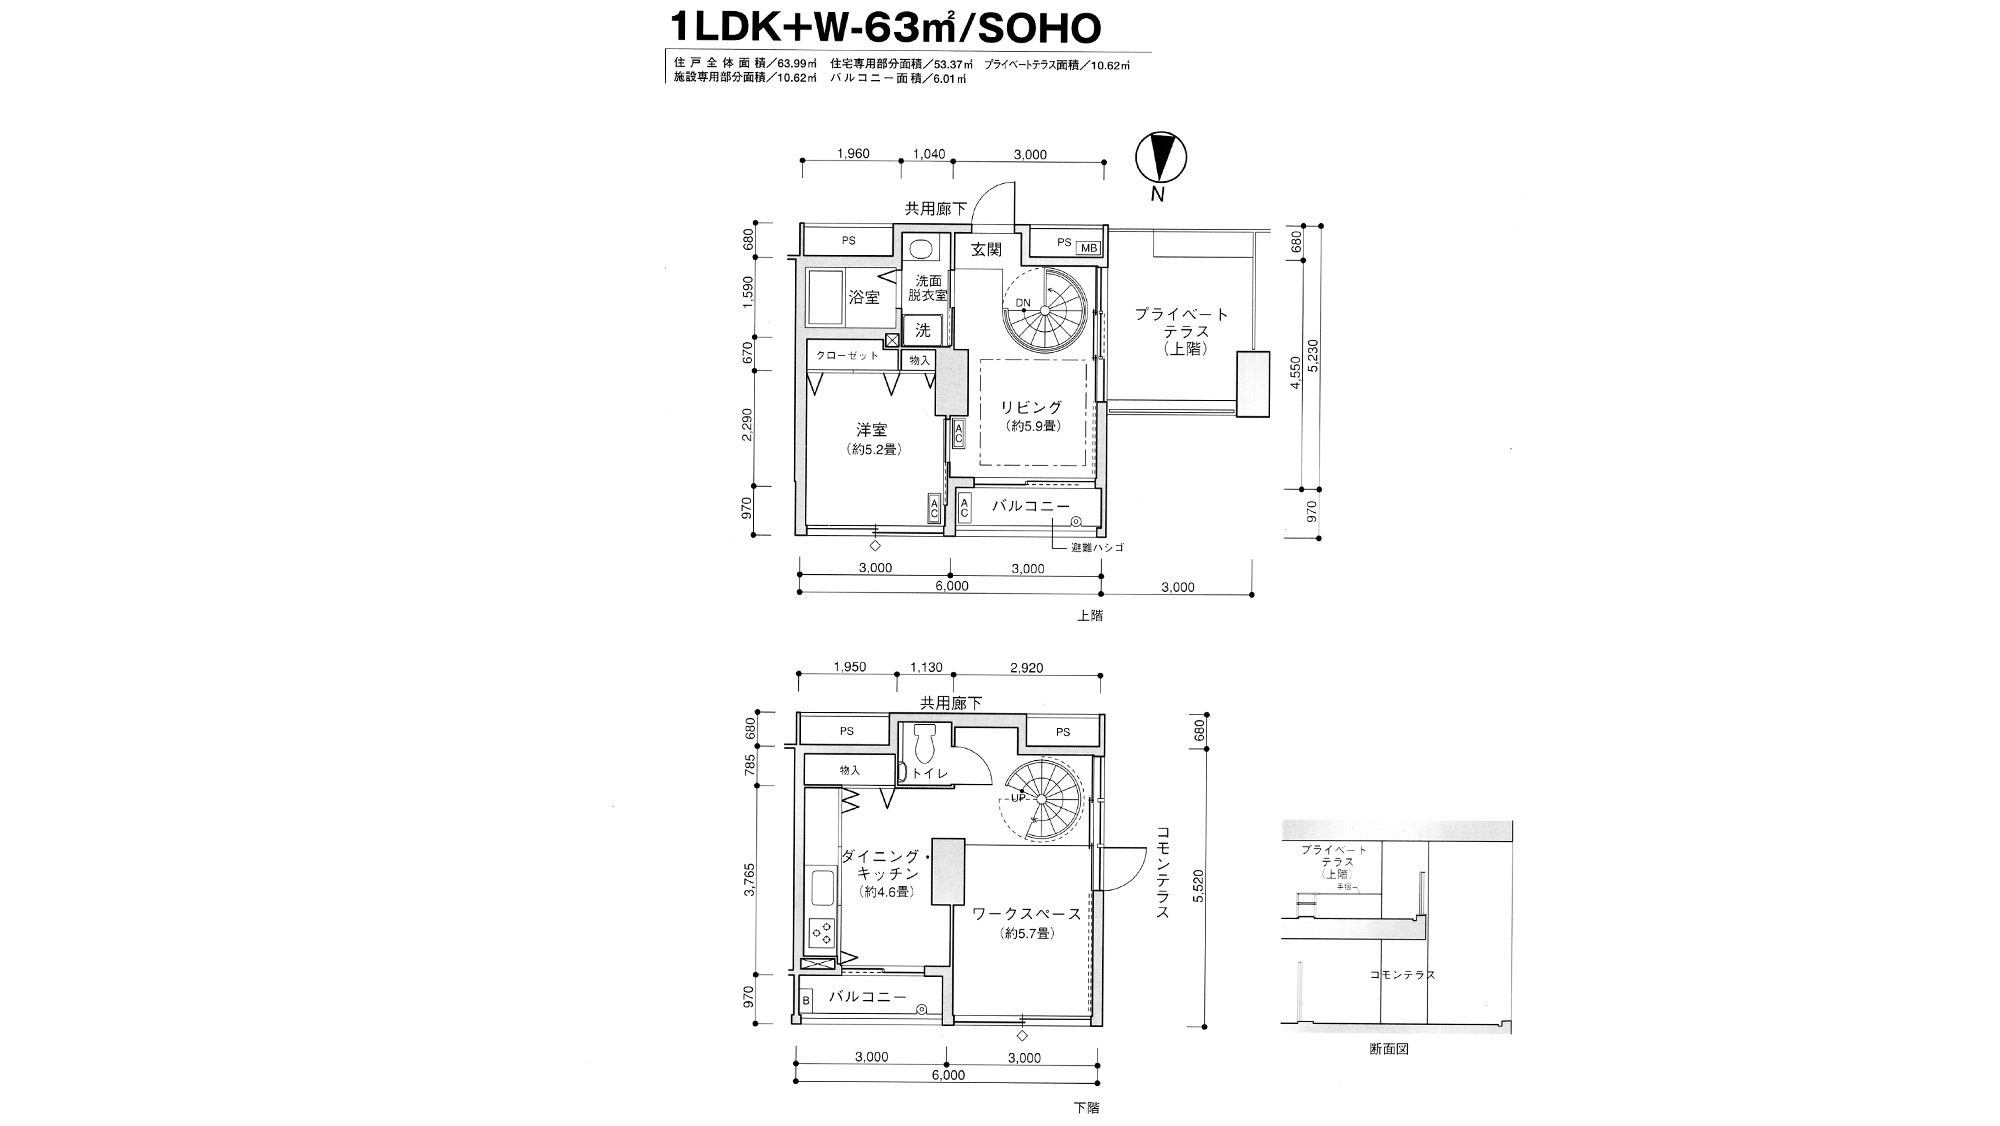 1LDK+W 63㎡ SOHO